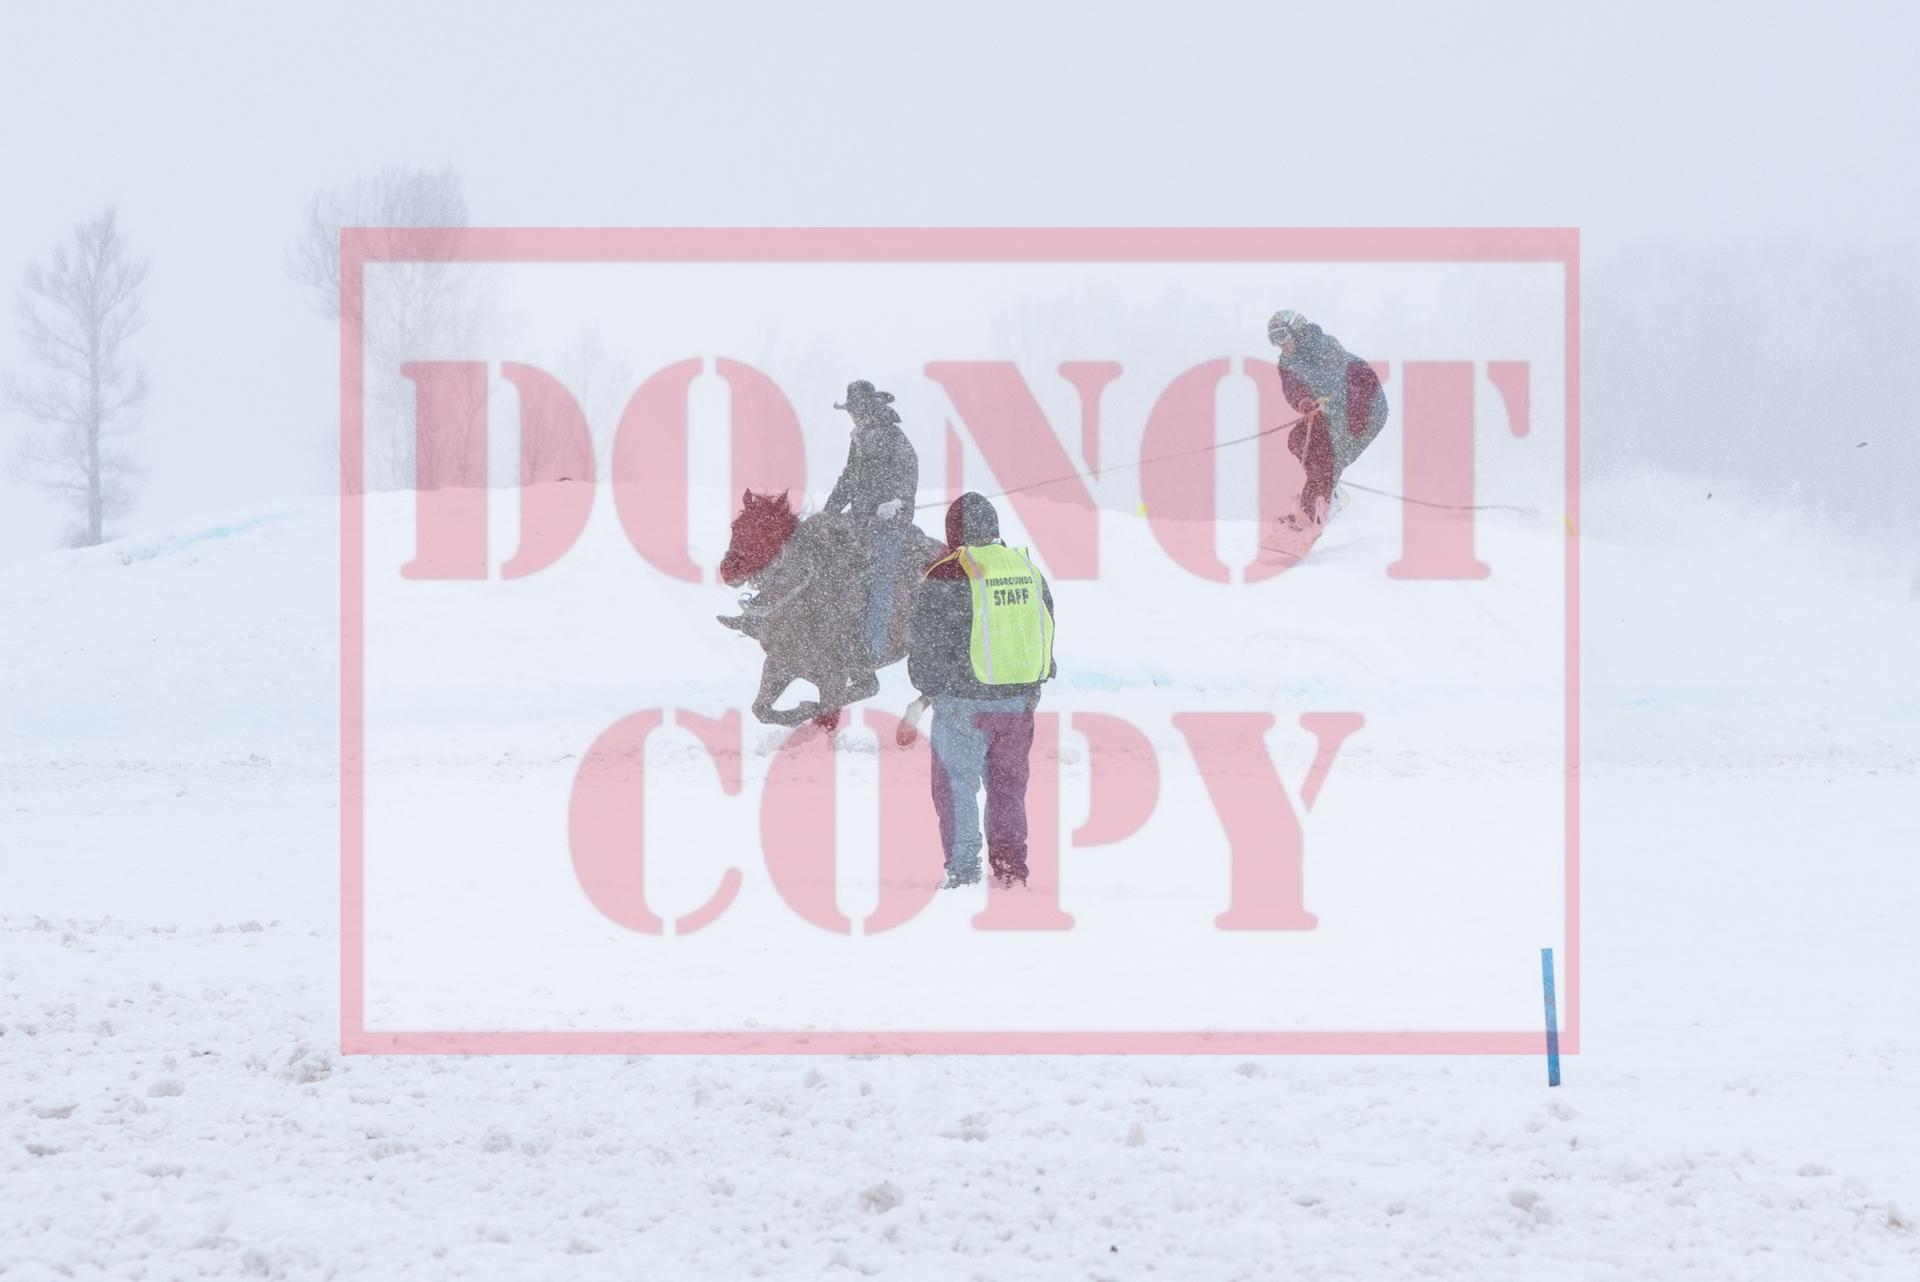 - JW Goode - Snowboard 1